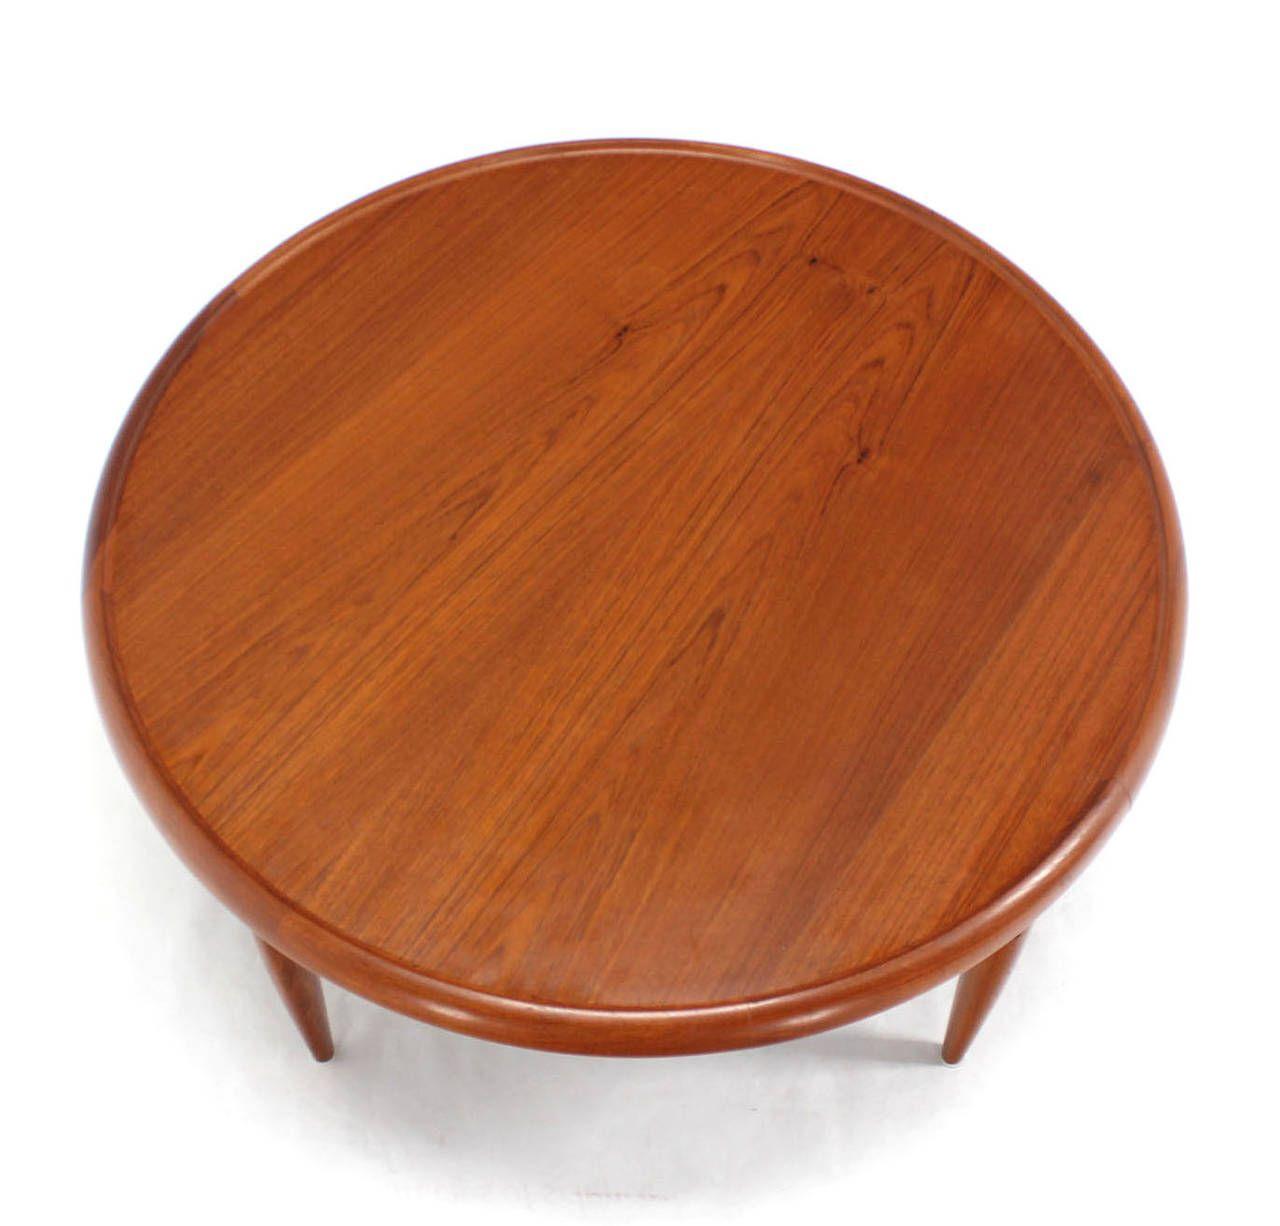 Reversible Flip Top Danish Modern Round Teak Coffee Table Coffee Table Teak Coffee Table Round Coffee Table Modern [ 1226 x 1280 Pixel ]